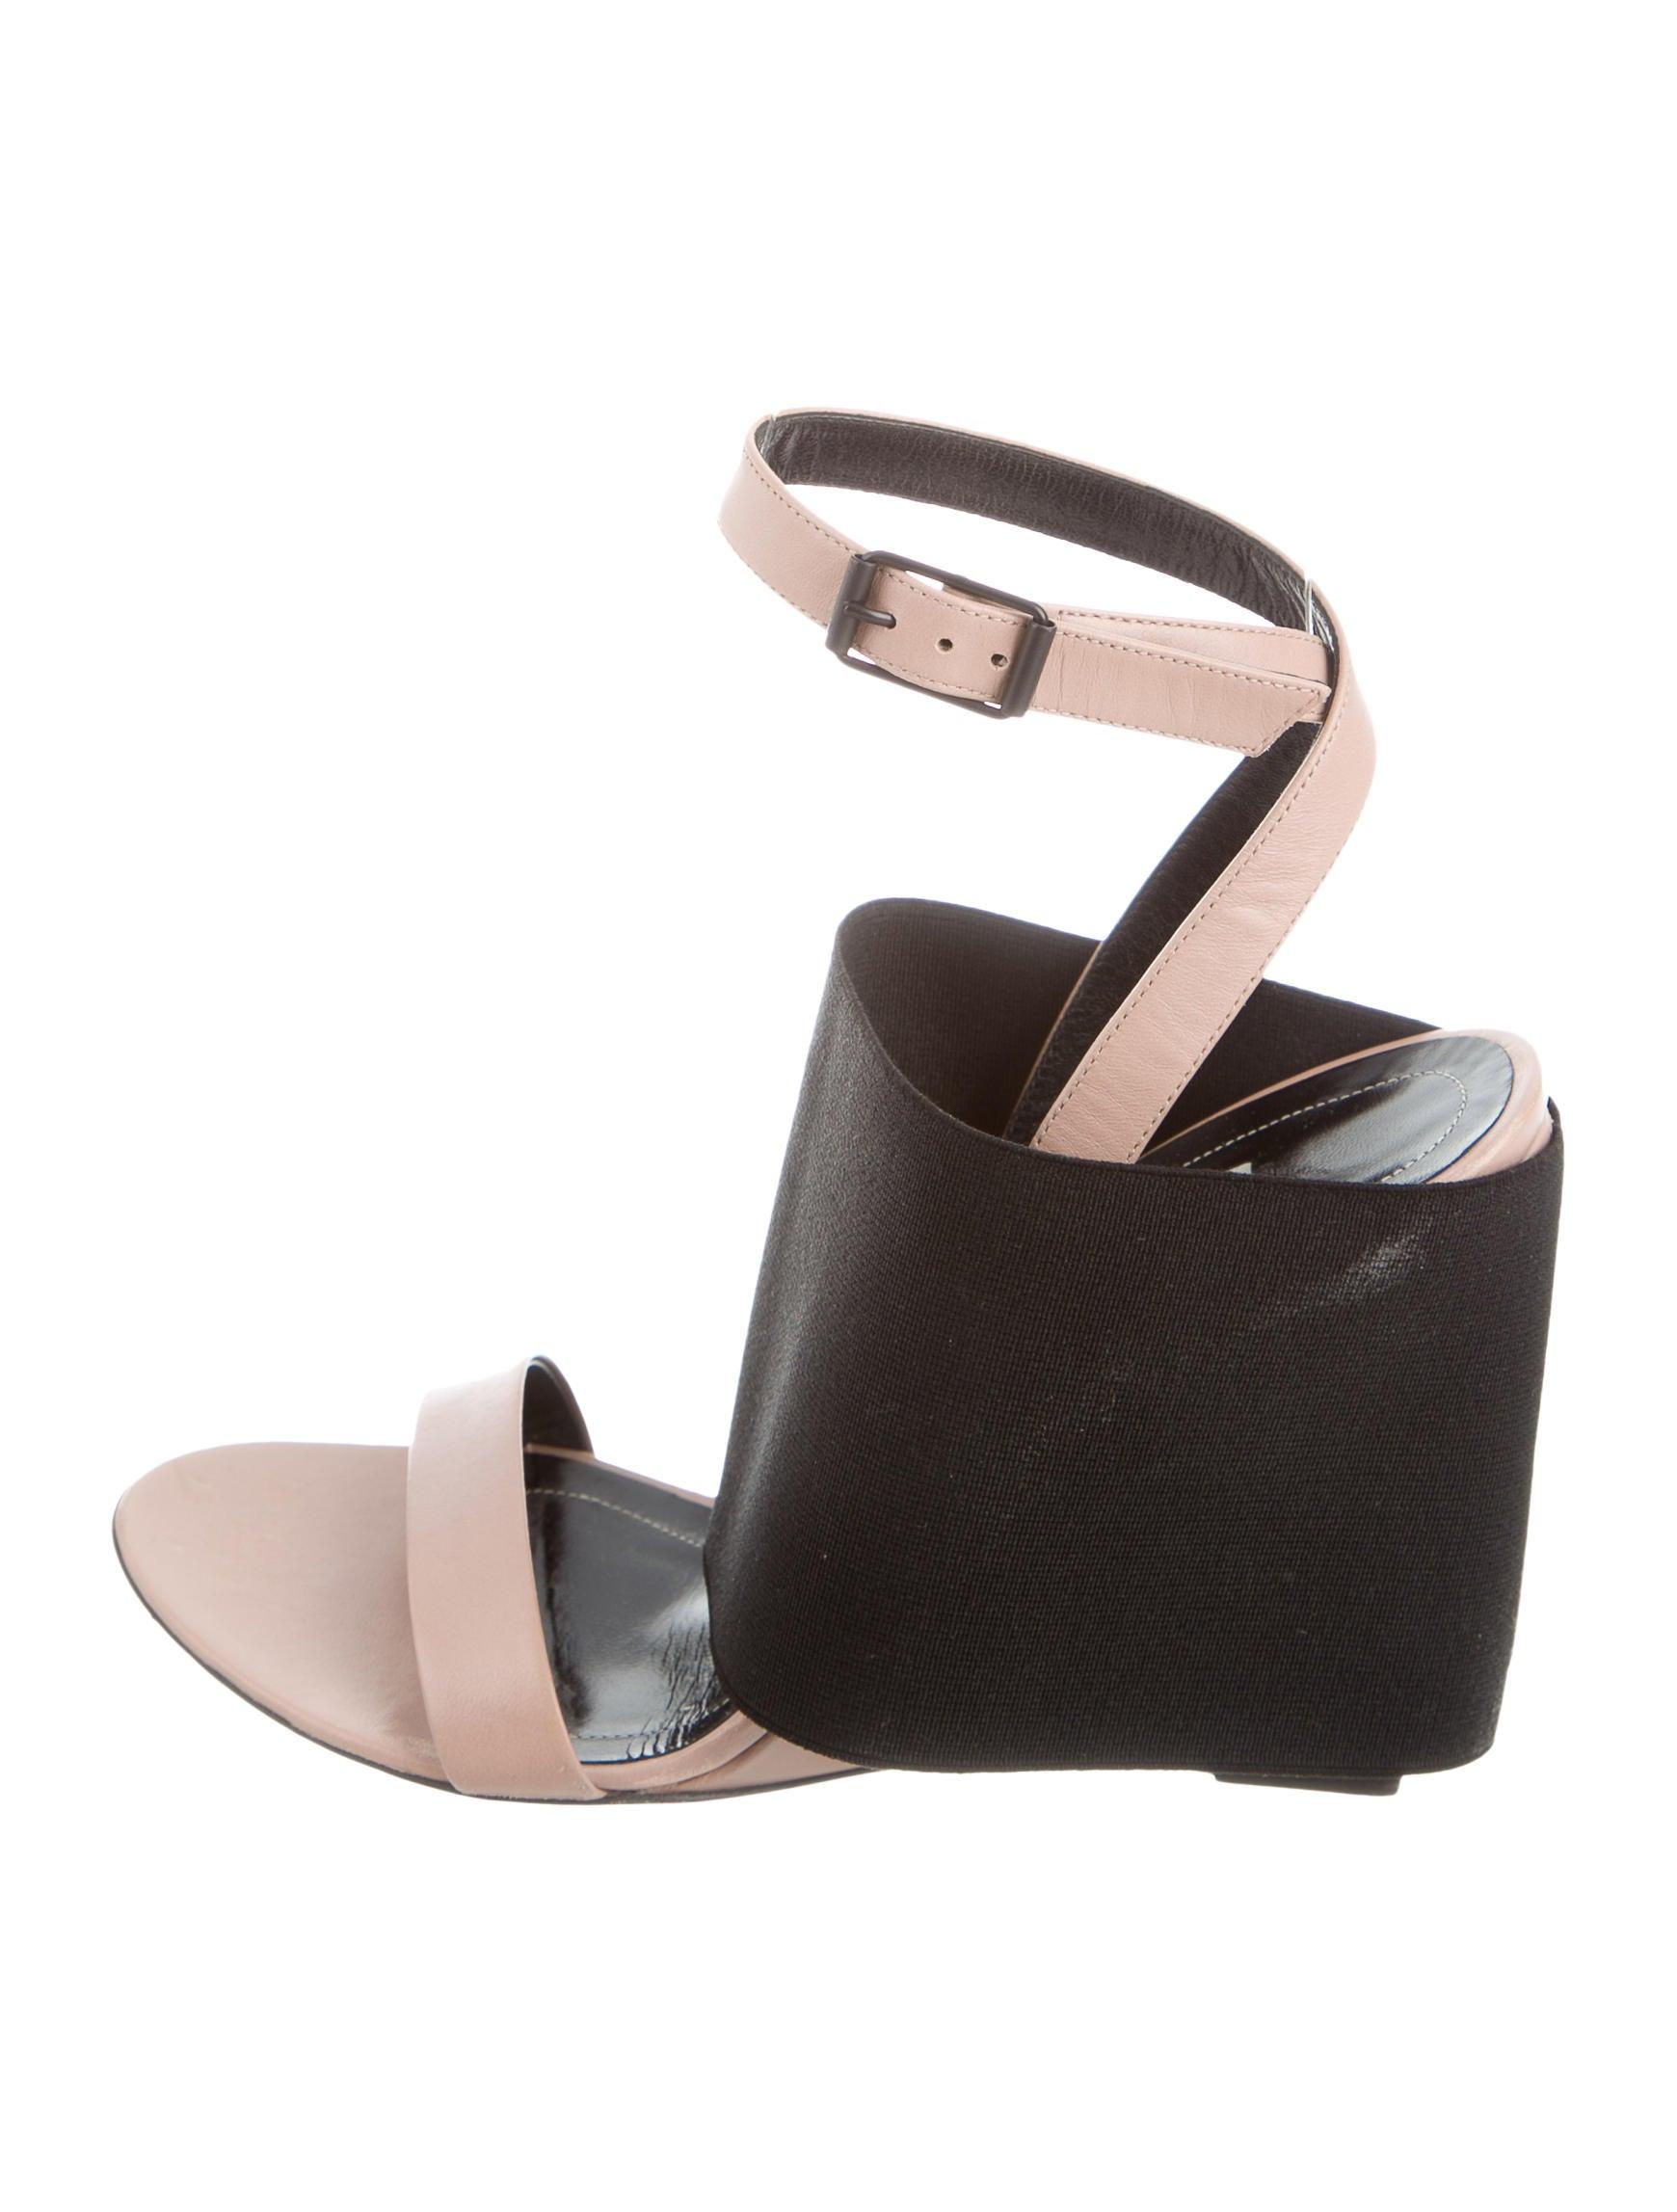 balenciaga prism wedge sandals shoes bal52907 the